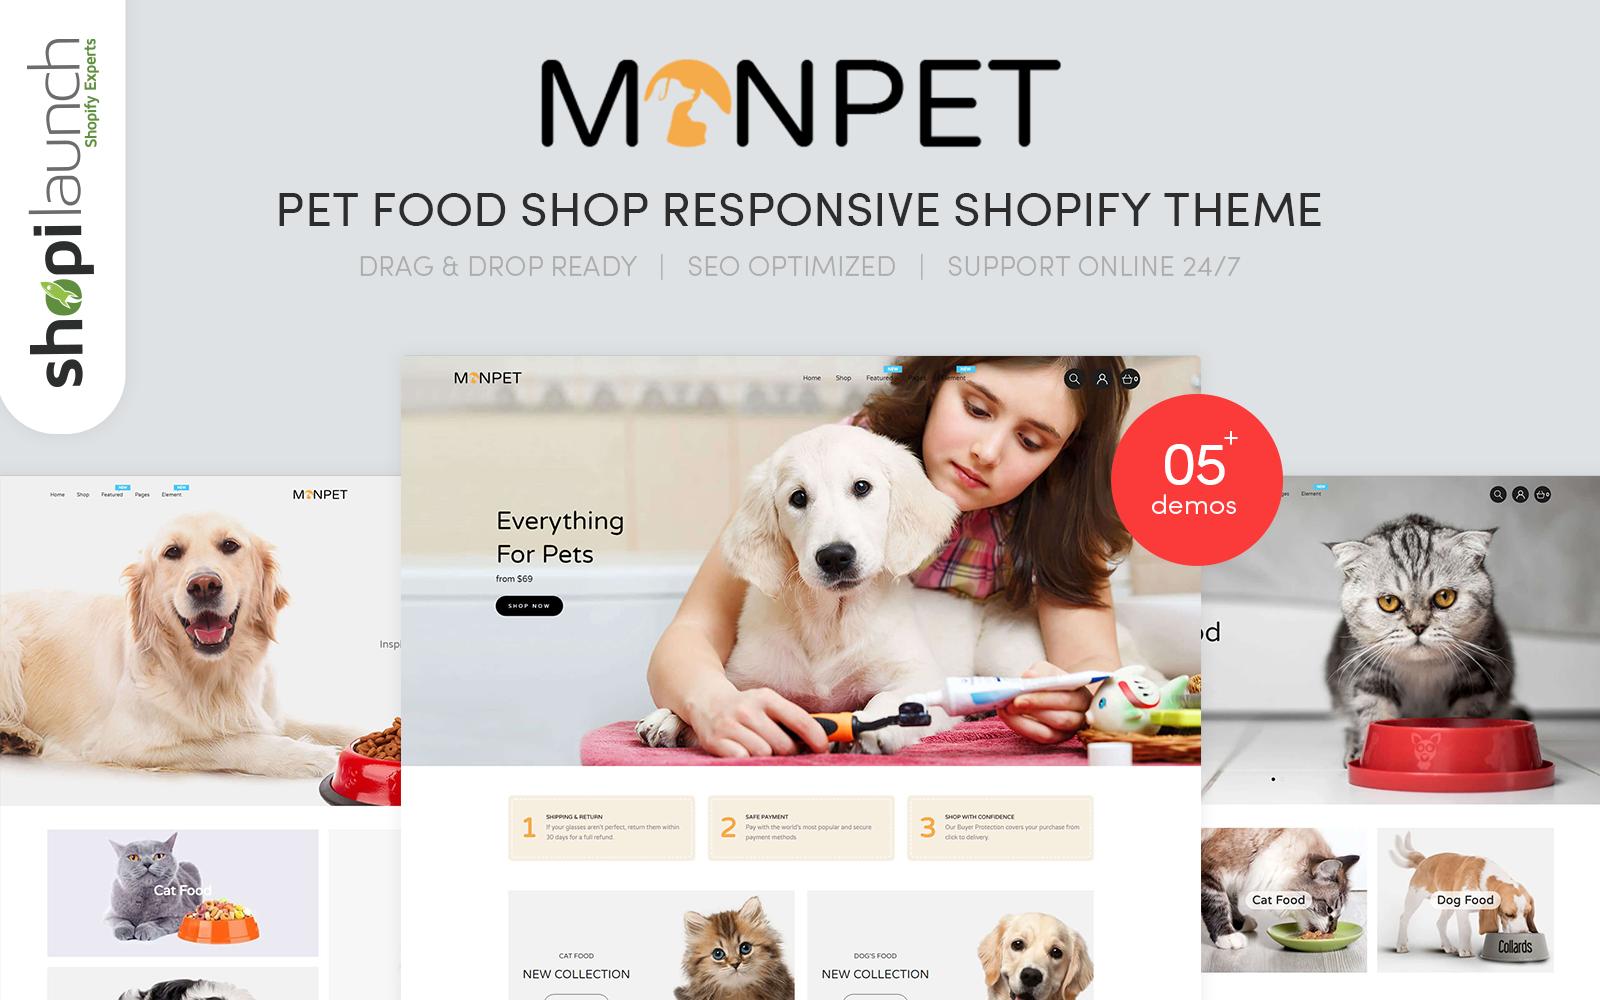 Monpet - Pet Food Shop Responsive Shopify Theme